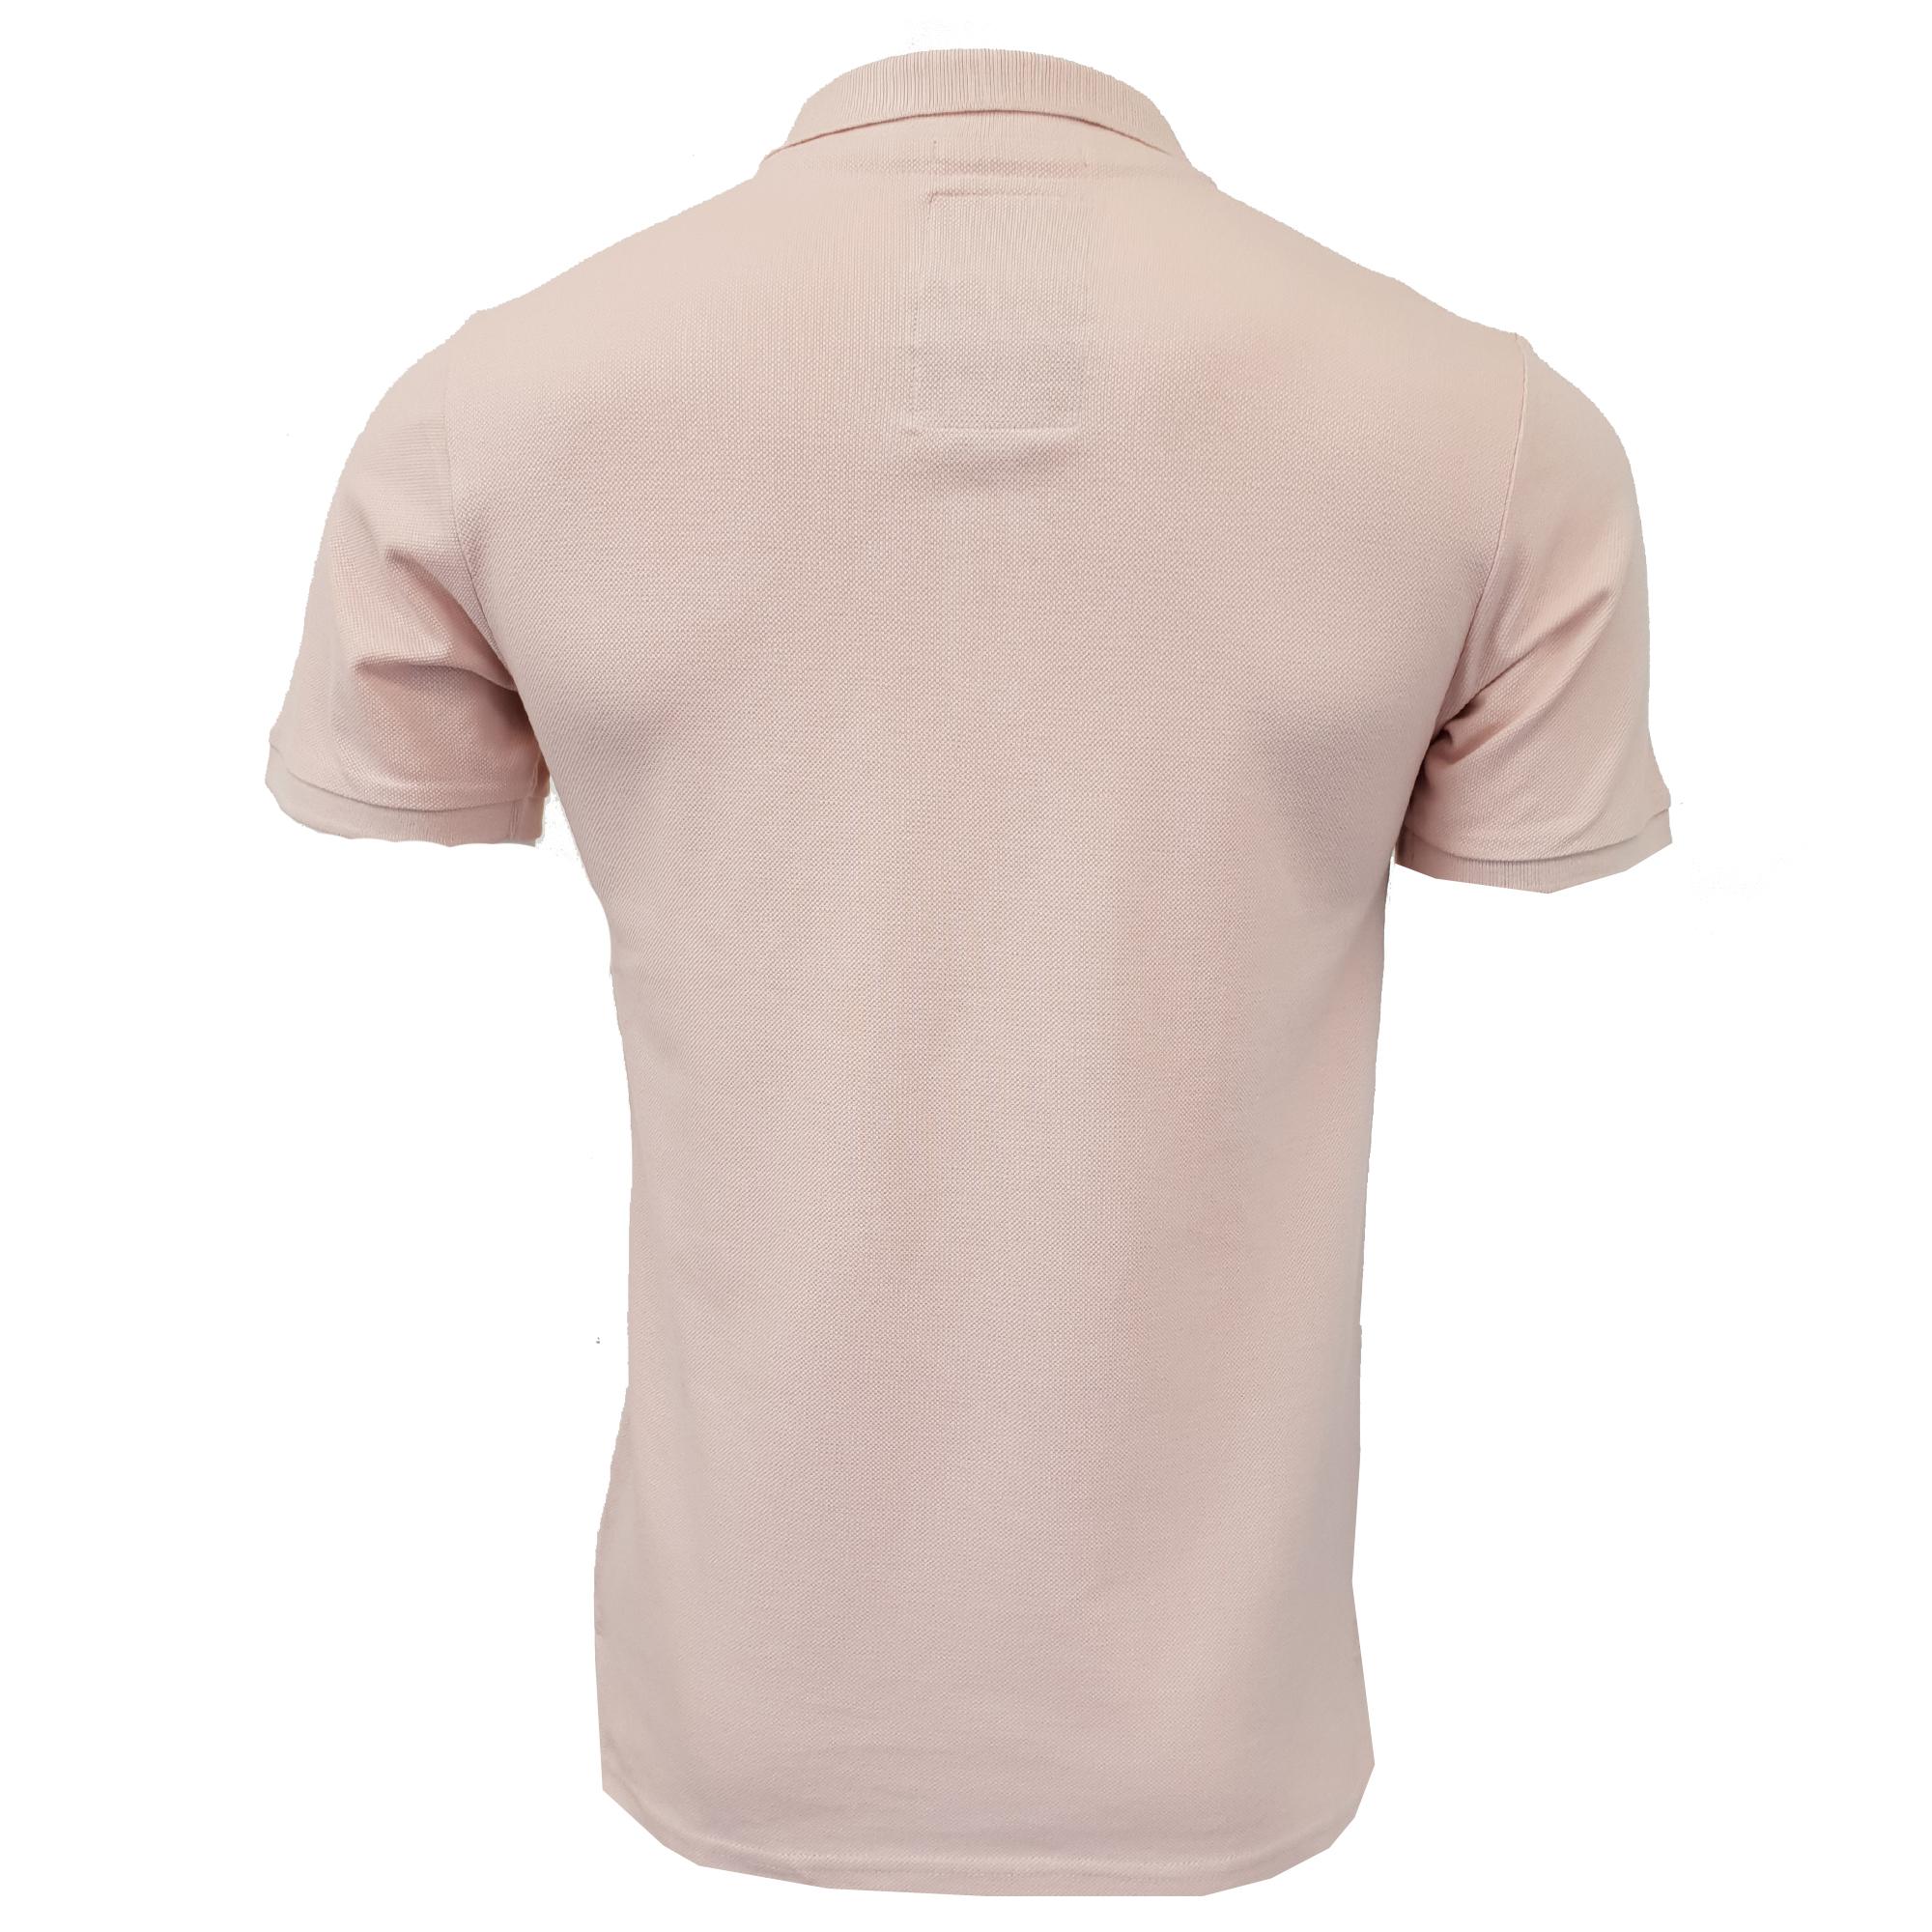 Mens-Pique-Polo-T-Shirt-Tokyo-Laundry-Florenzi-Short-Sleeved-Top-Casual-Summer thumbnail 20